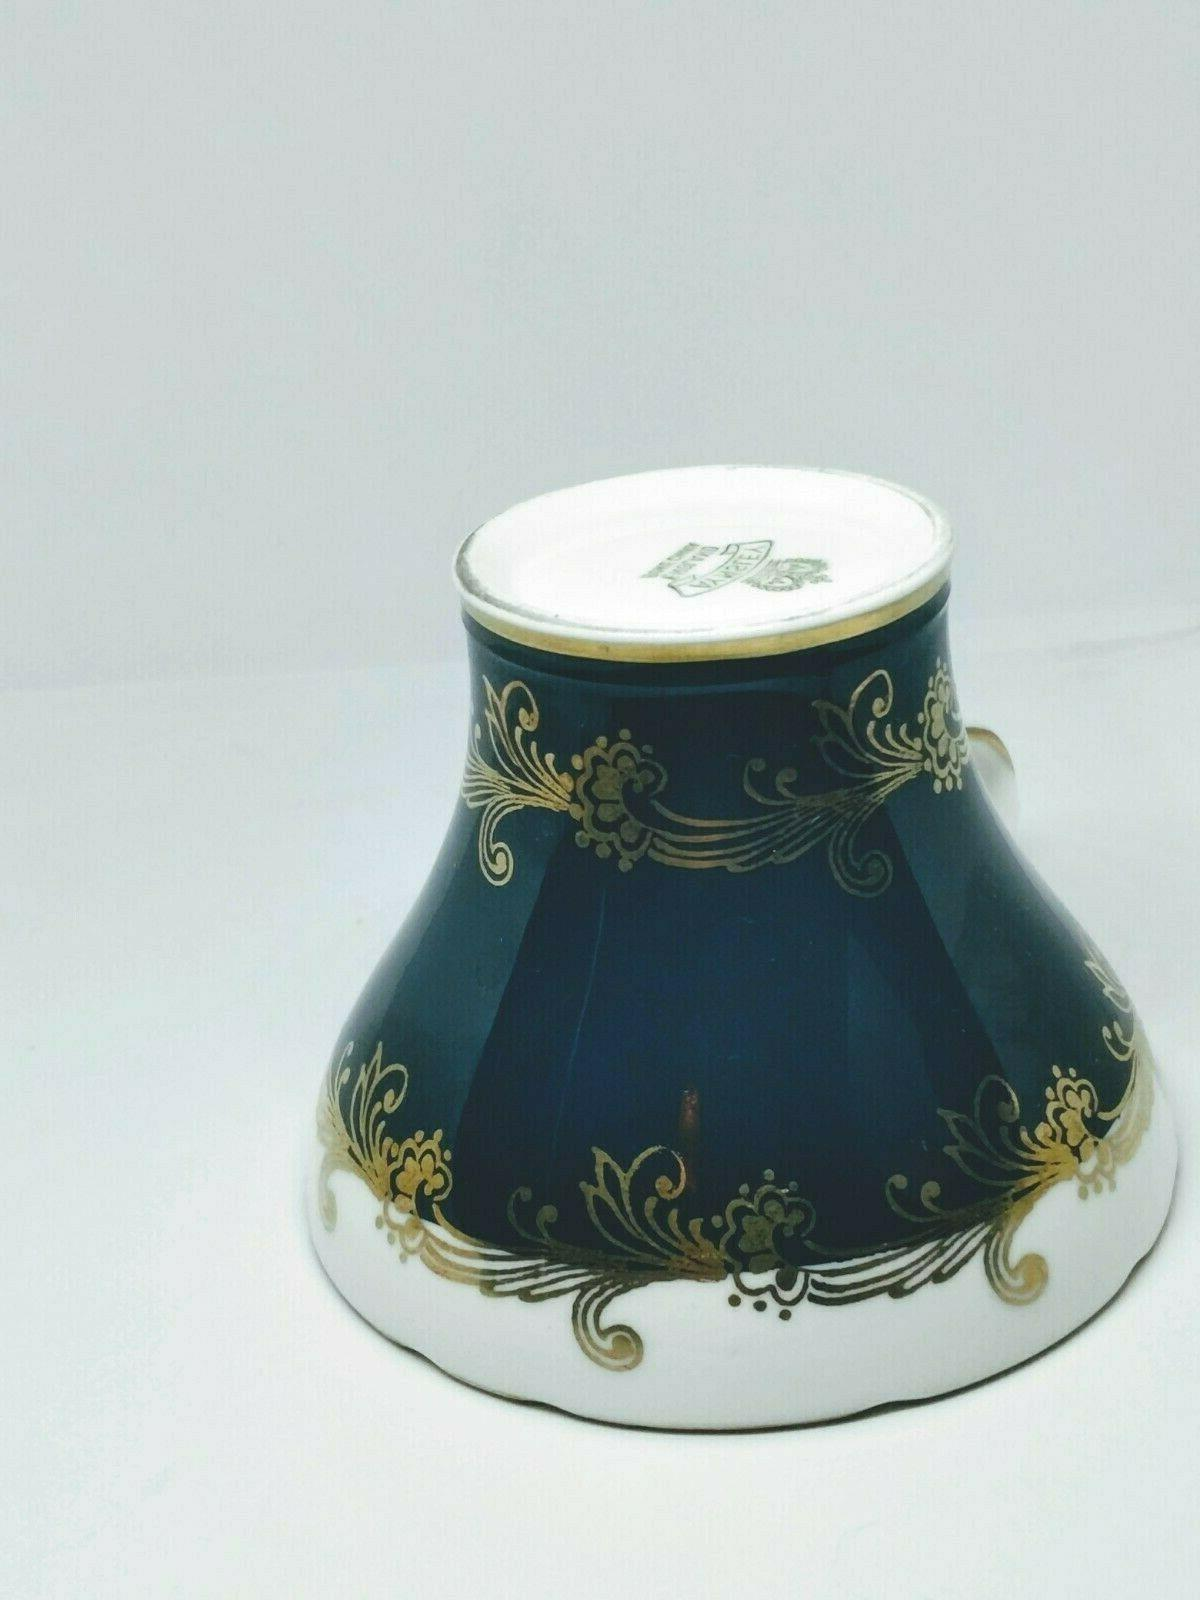 Aynsley England China Corset- Shaped & Saucer 1934